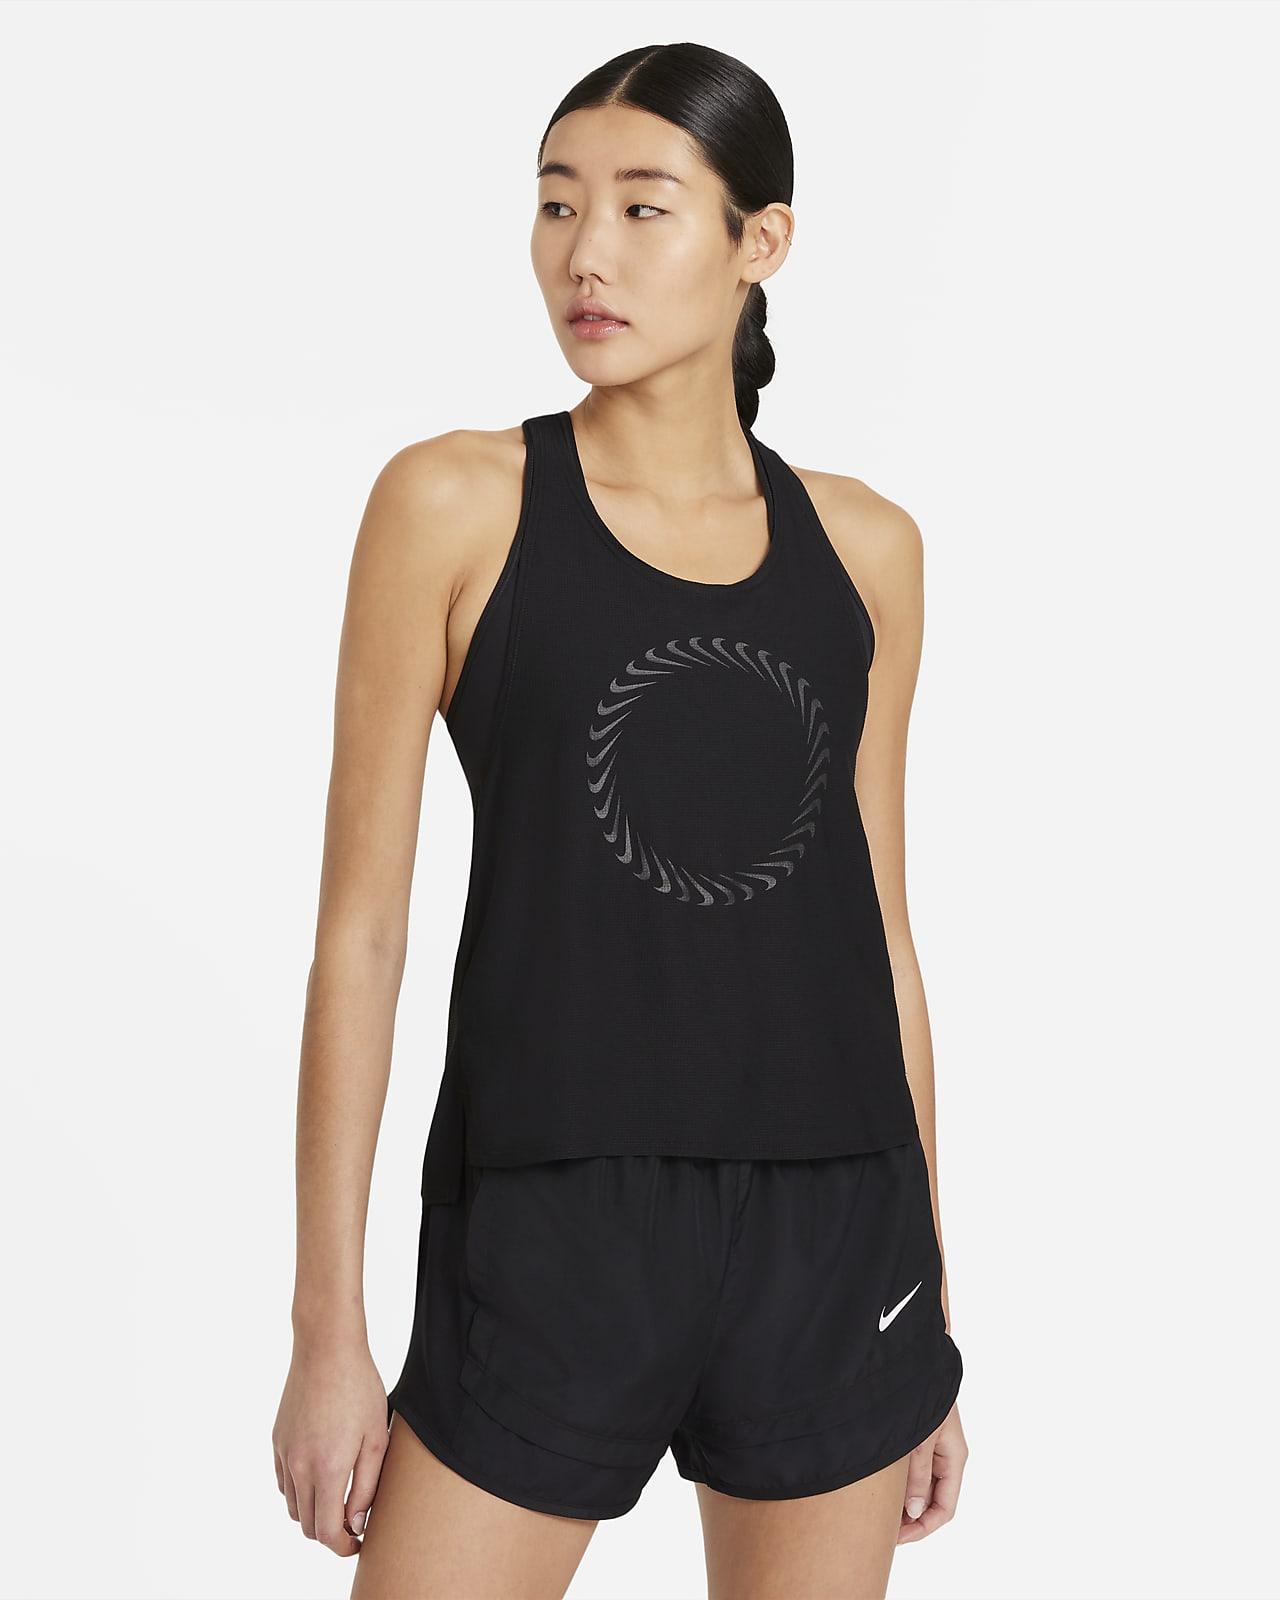 Nike Icon Clash Miler Women's Running Tank